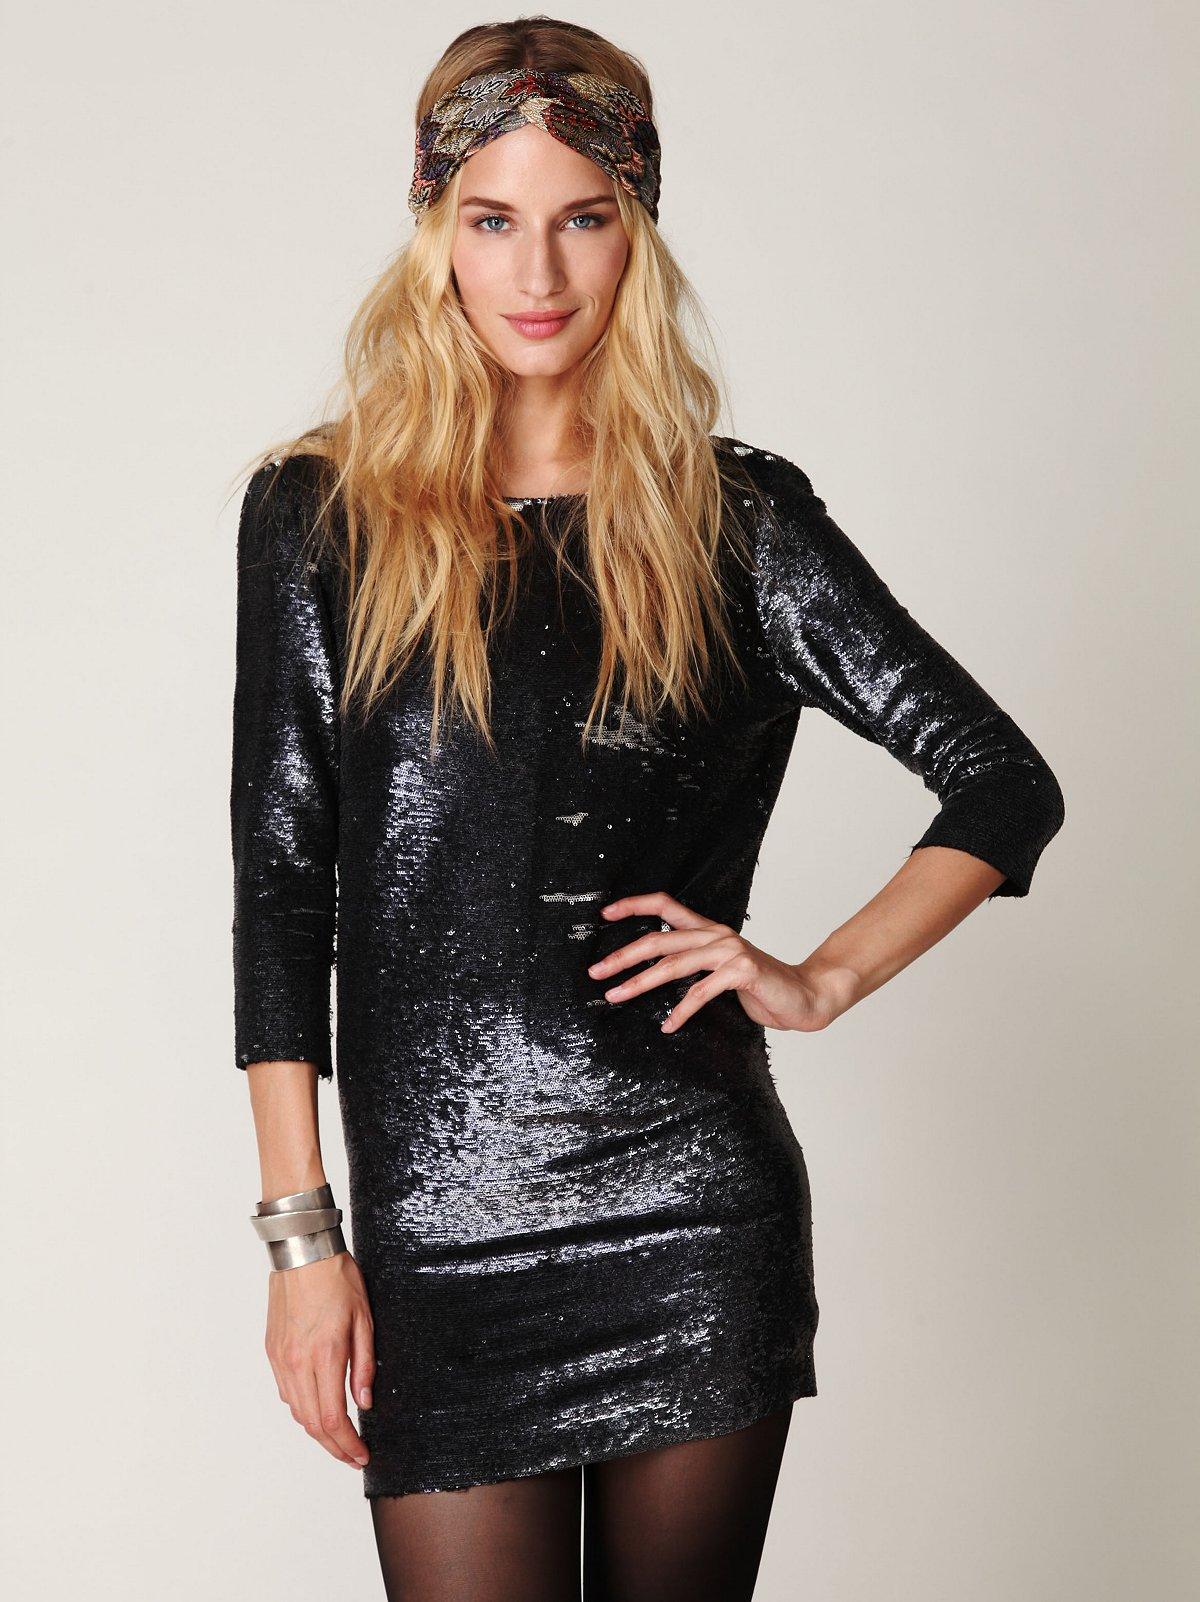 Blackheart Sequin Dress